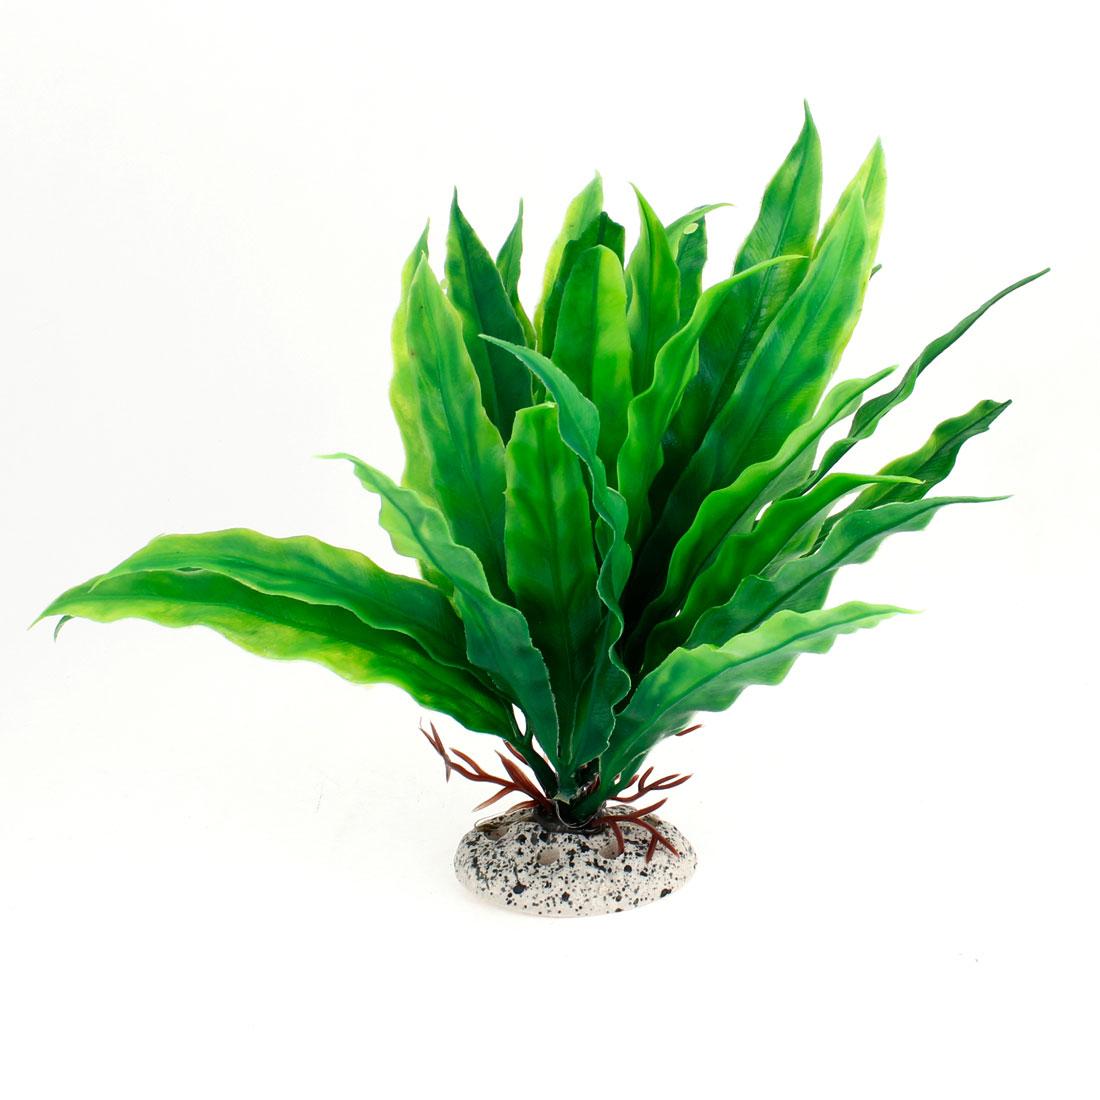 Green Leaves Mnamade Aquatic Plant Decoration for Aquarium Fish Tank